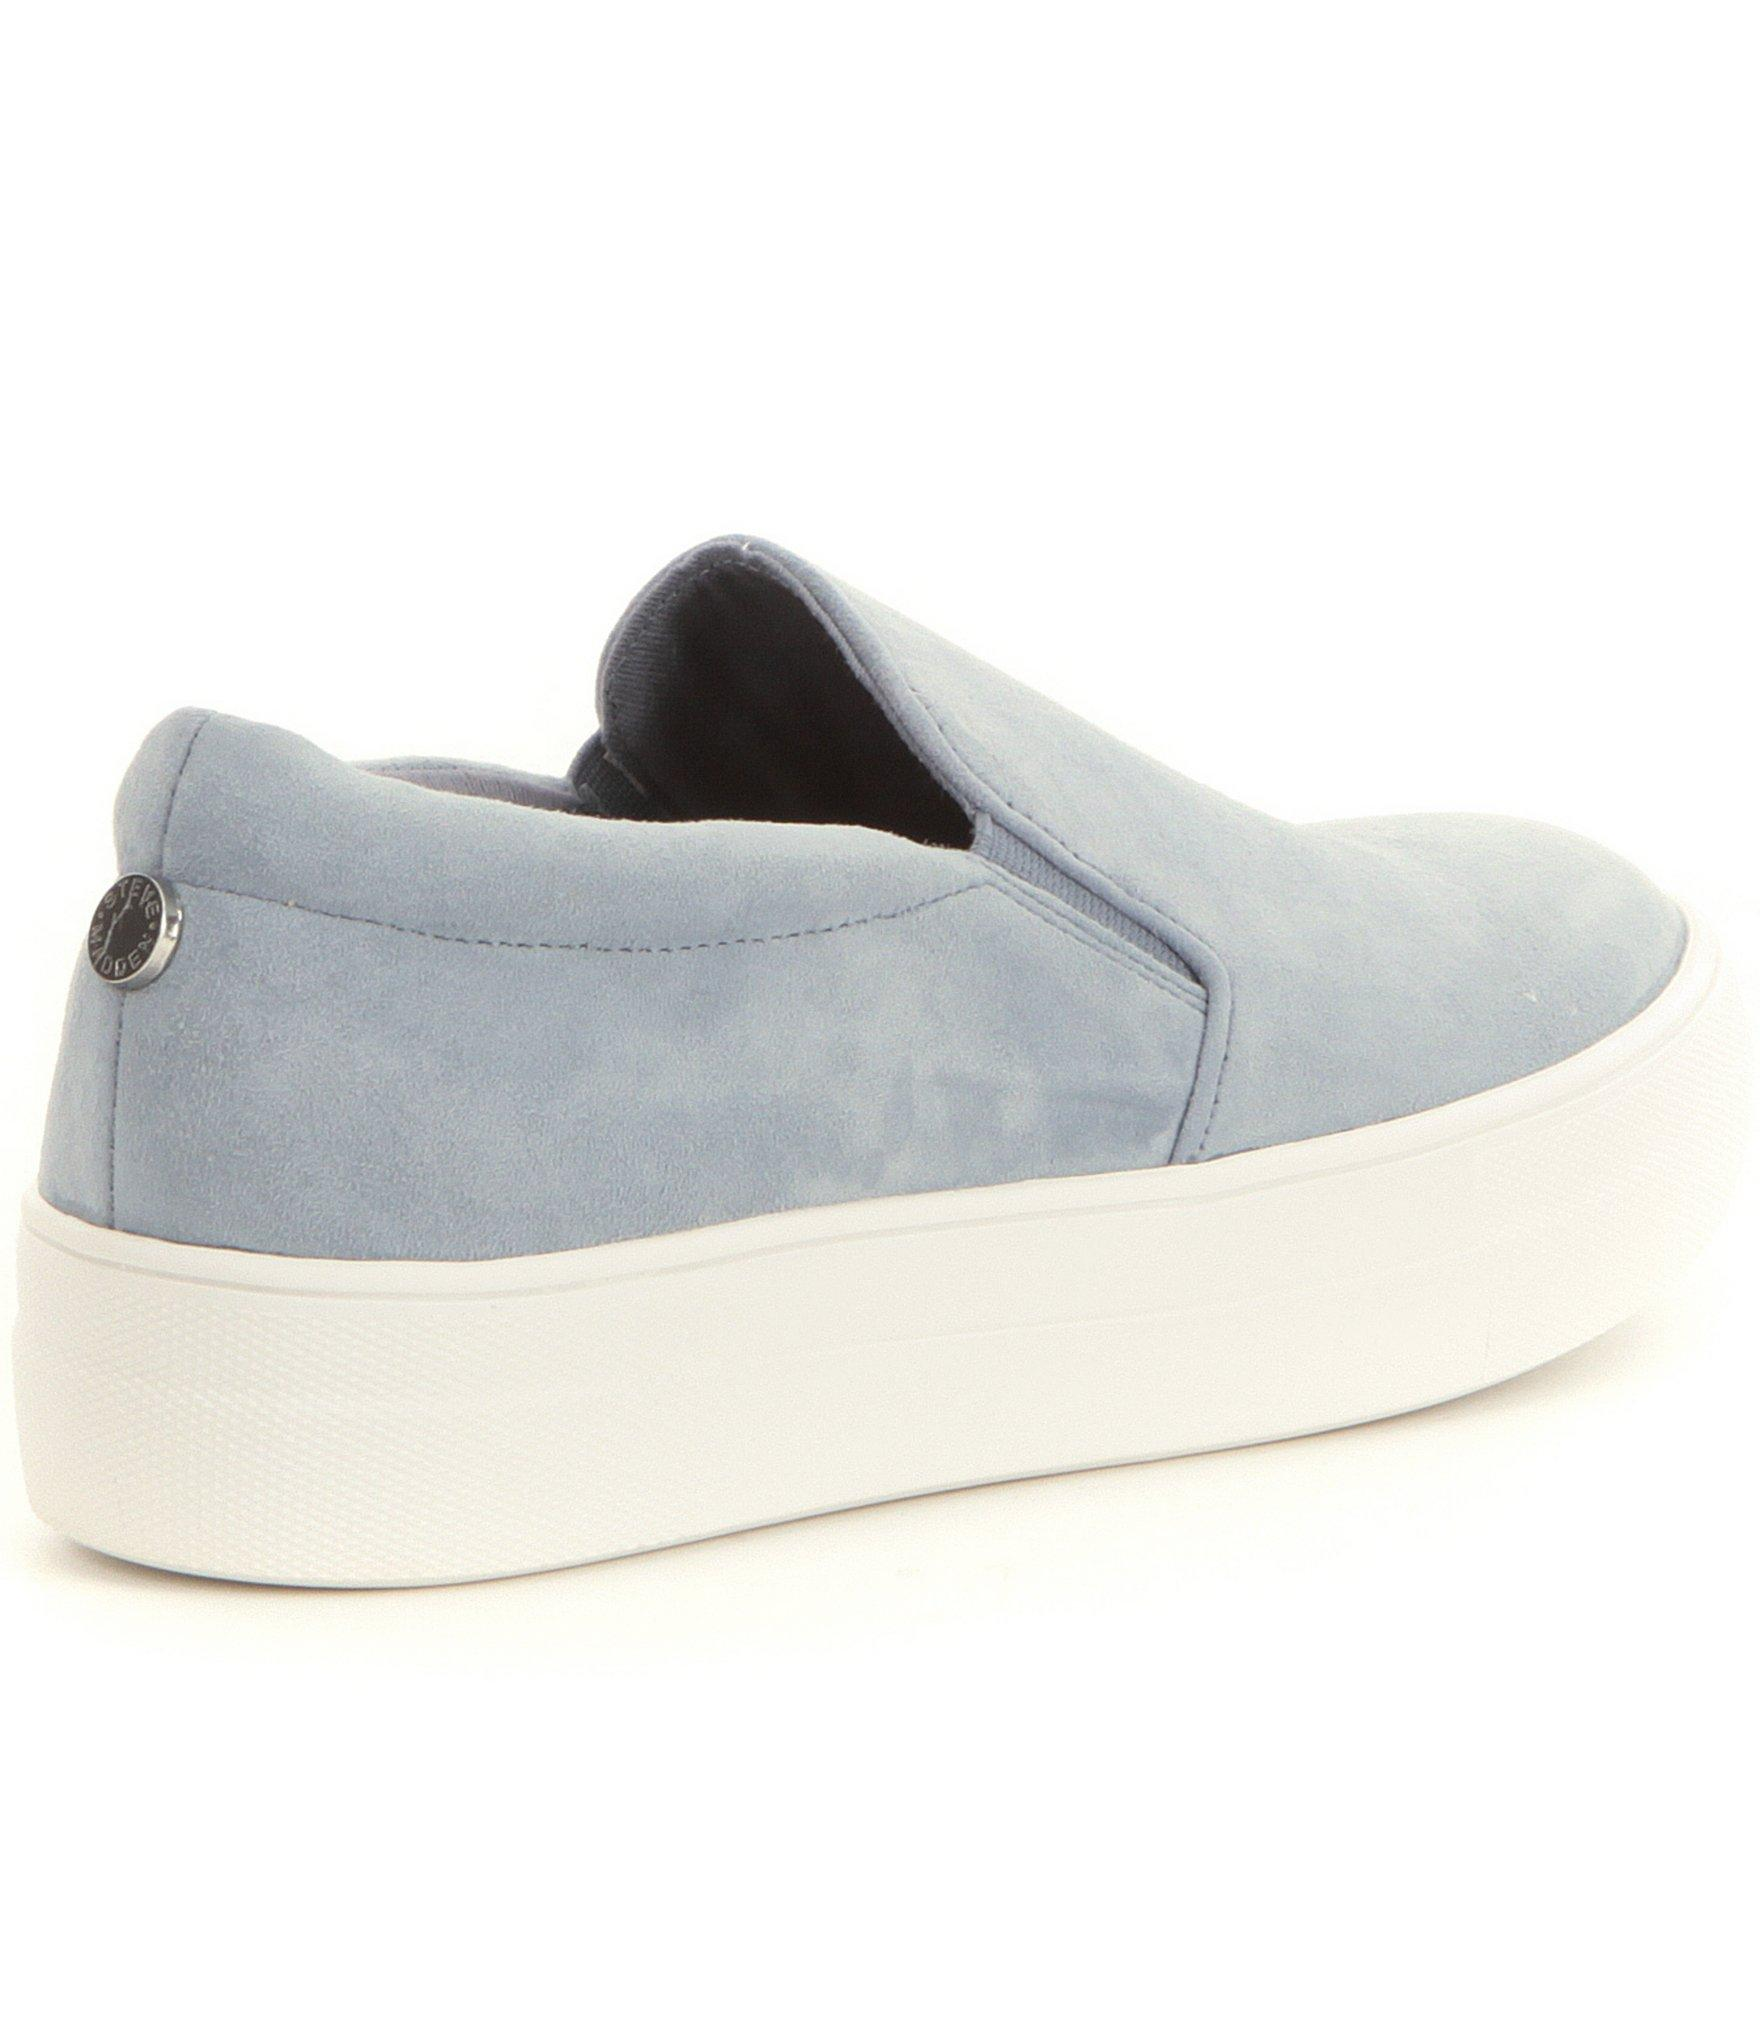 1ff884e333d Lyst - Steve Madden Gills Suede Slip On Platform Sneakers in Blue